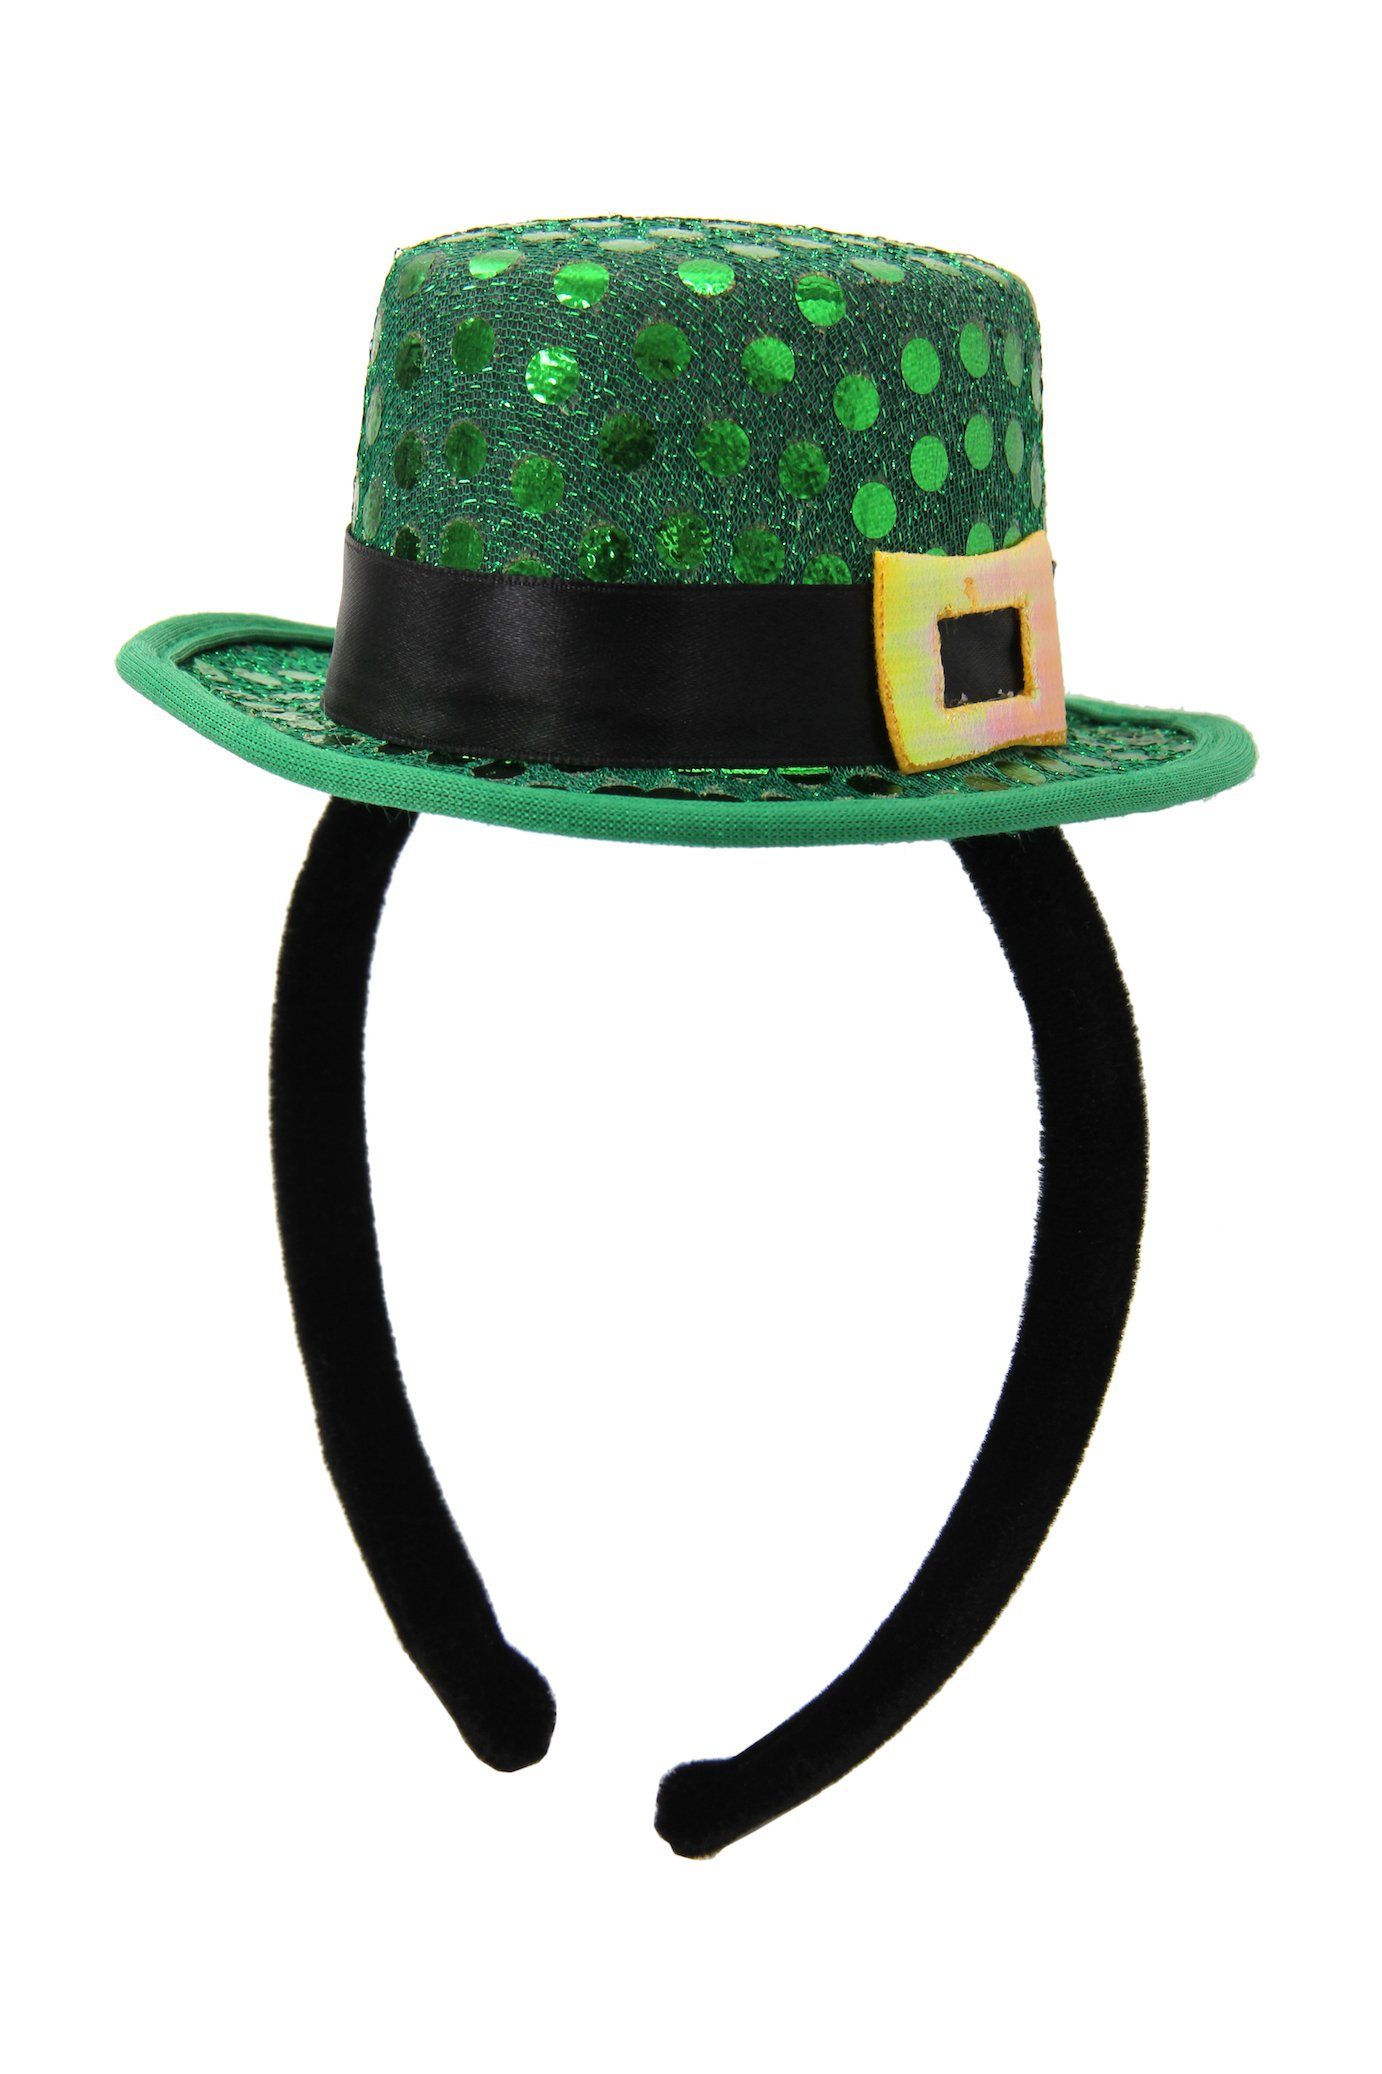 elope Mini Leprechaun Sequin Hat, Green, One Size